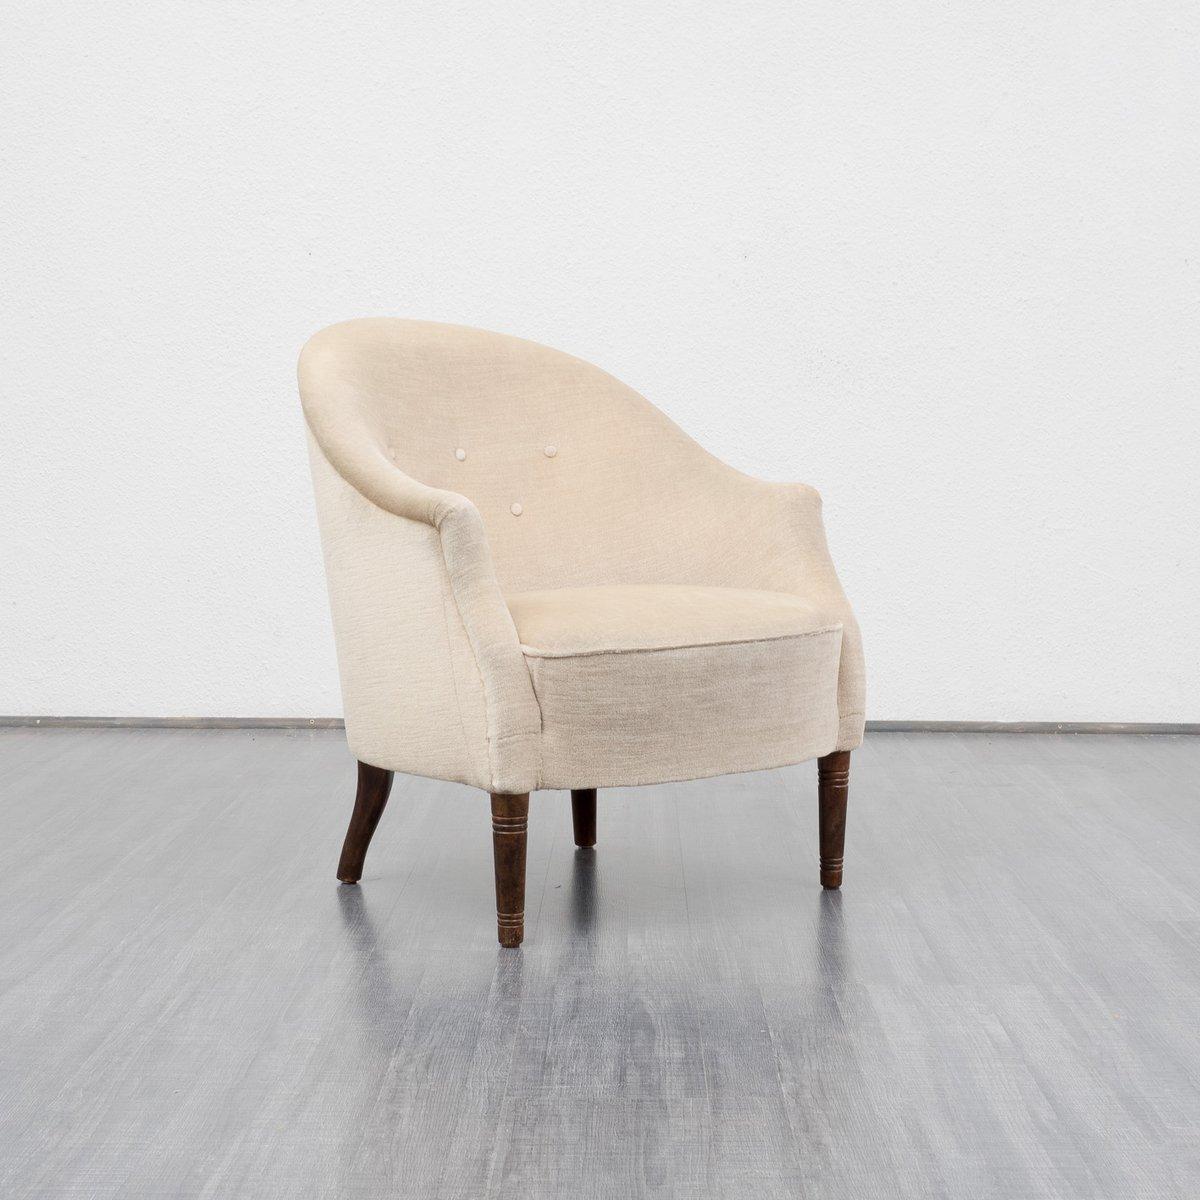 Vintage wildleder sessel bei pamono kaufen for Sessel wildleder